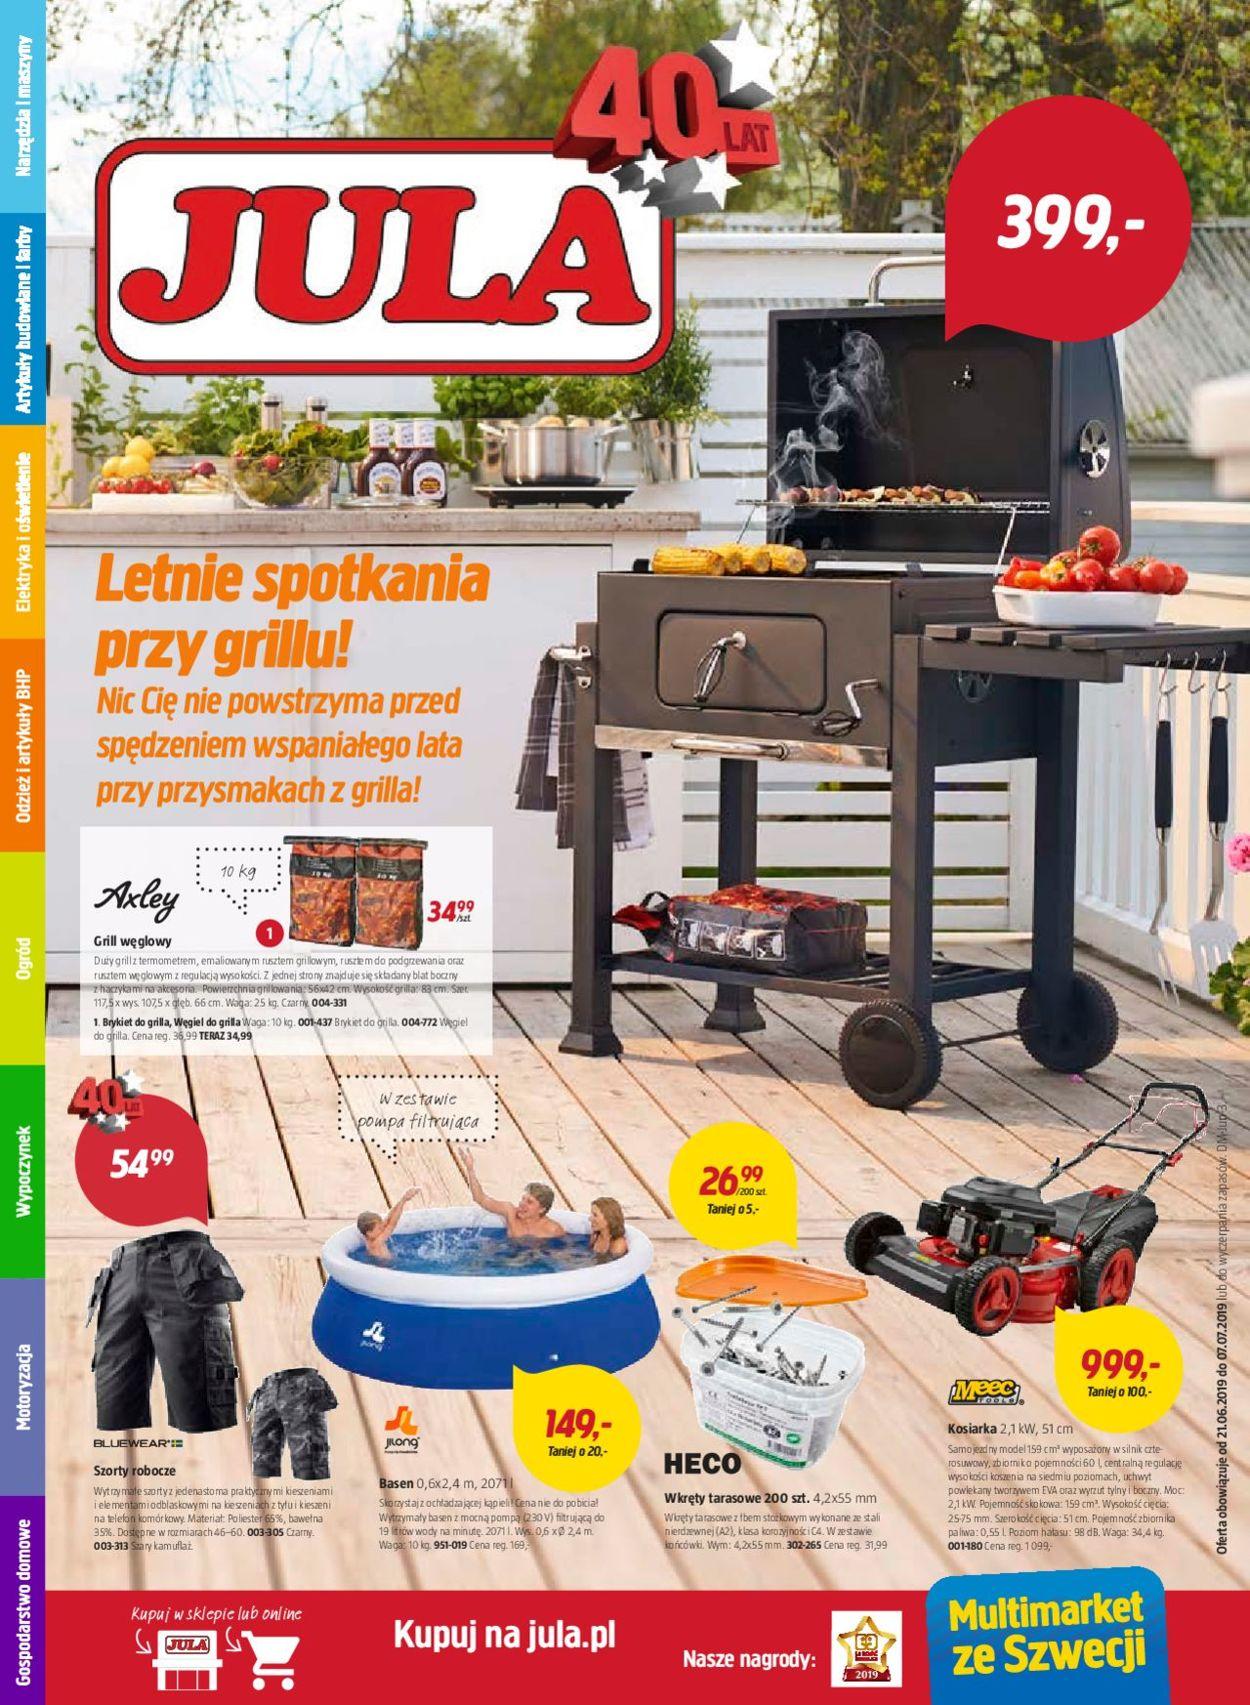 Gazetka promocyjna Jula - 21.06-07.07.2019